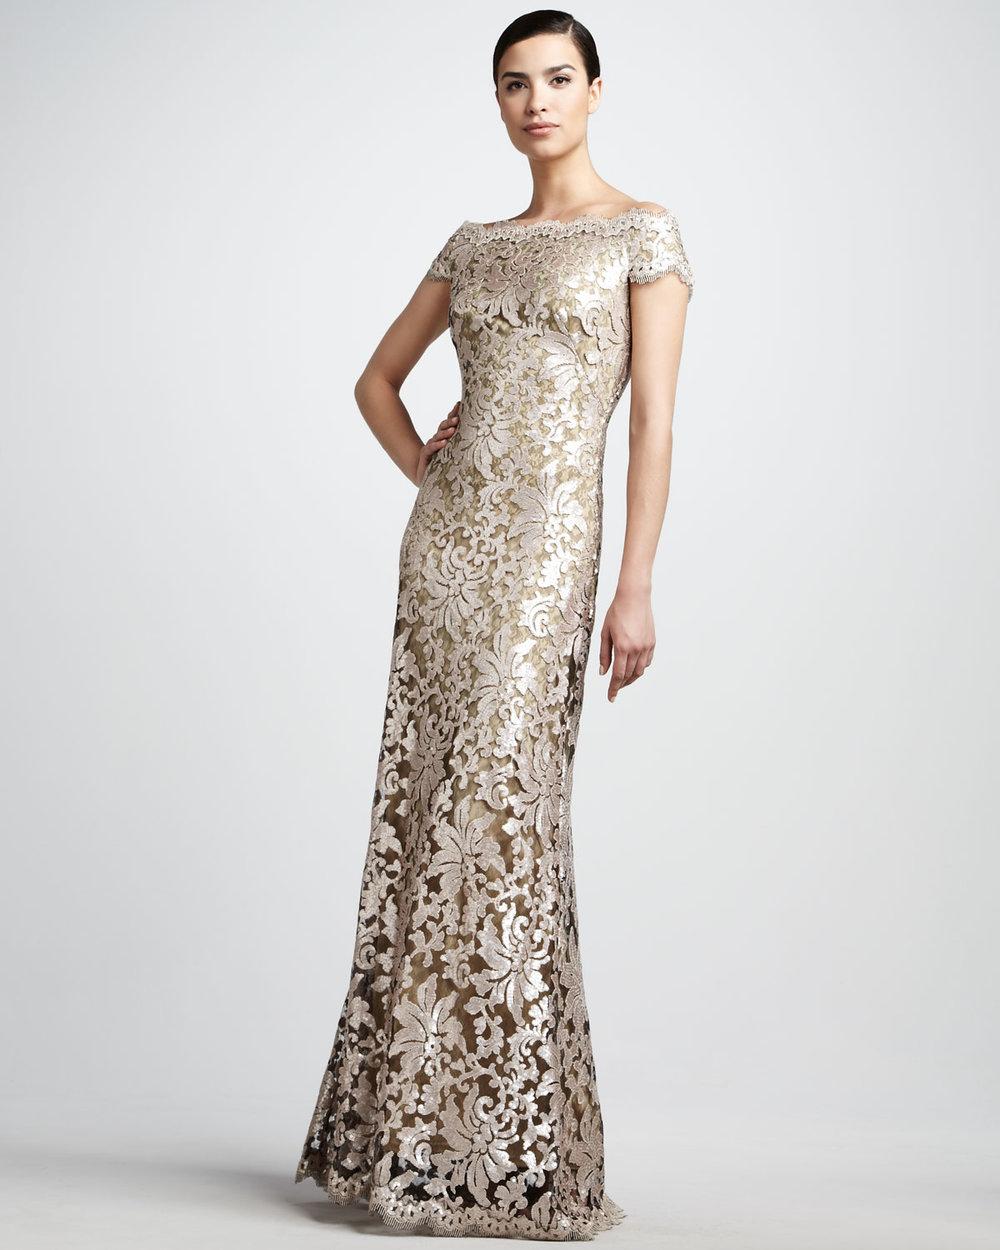 the evening dress